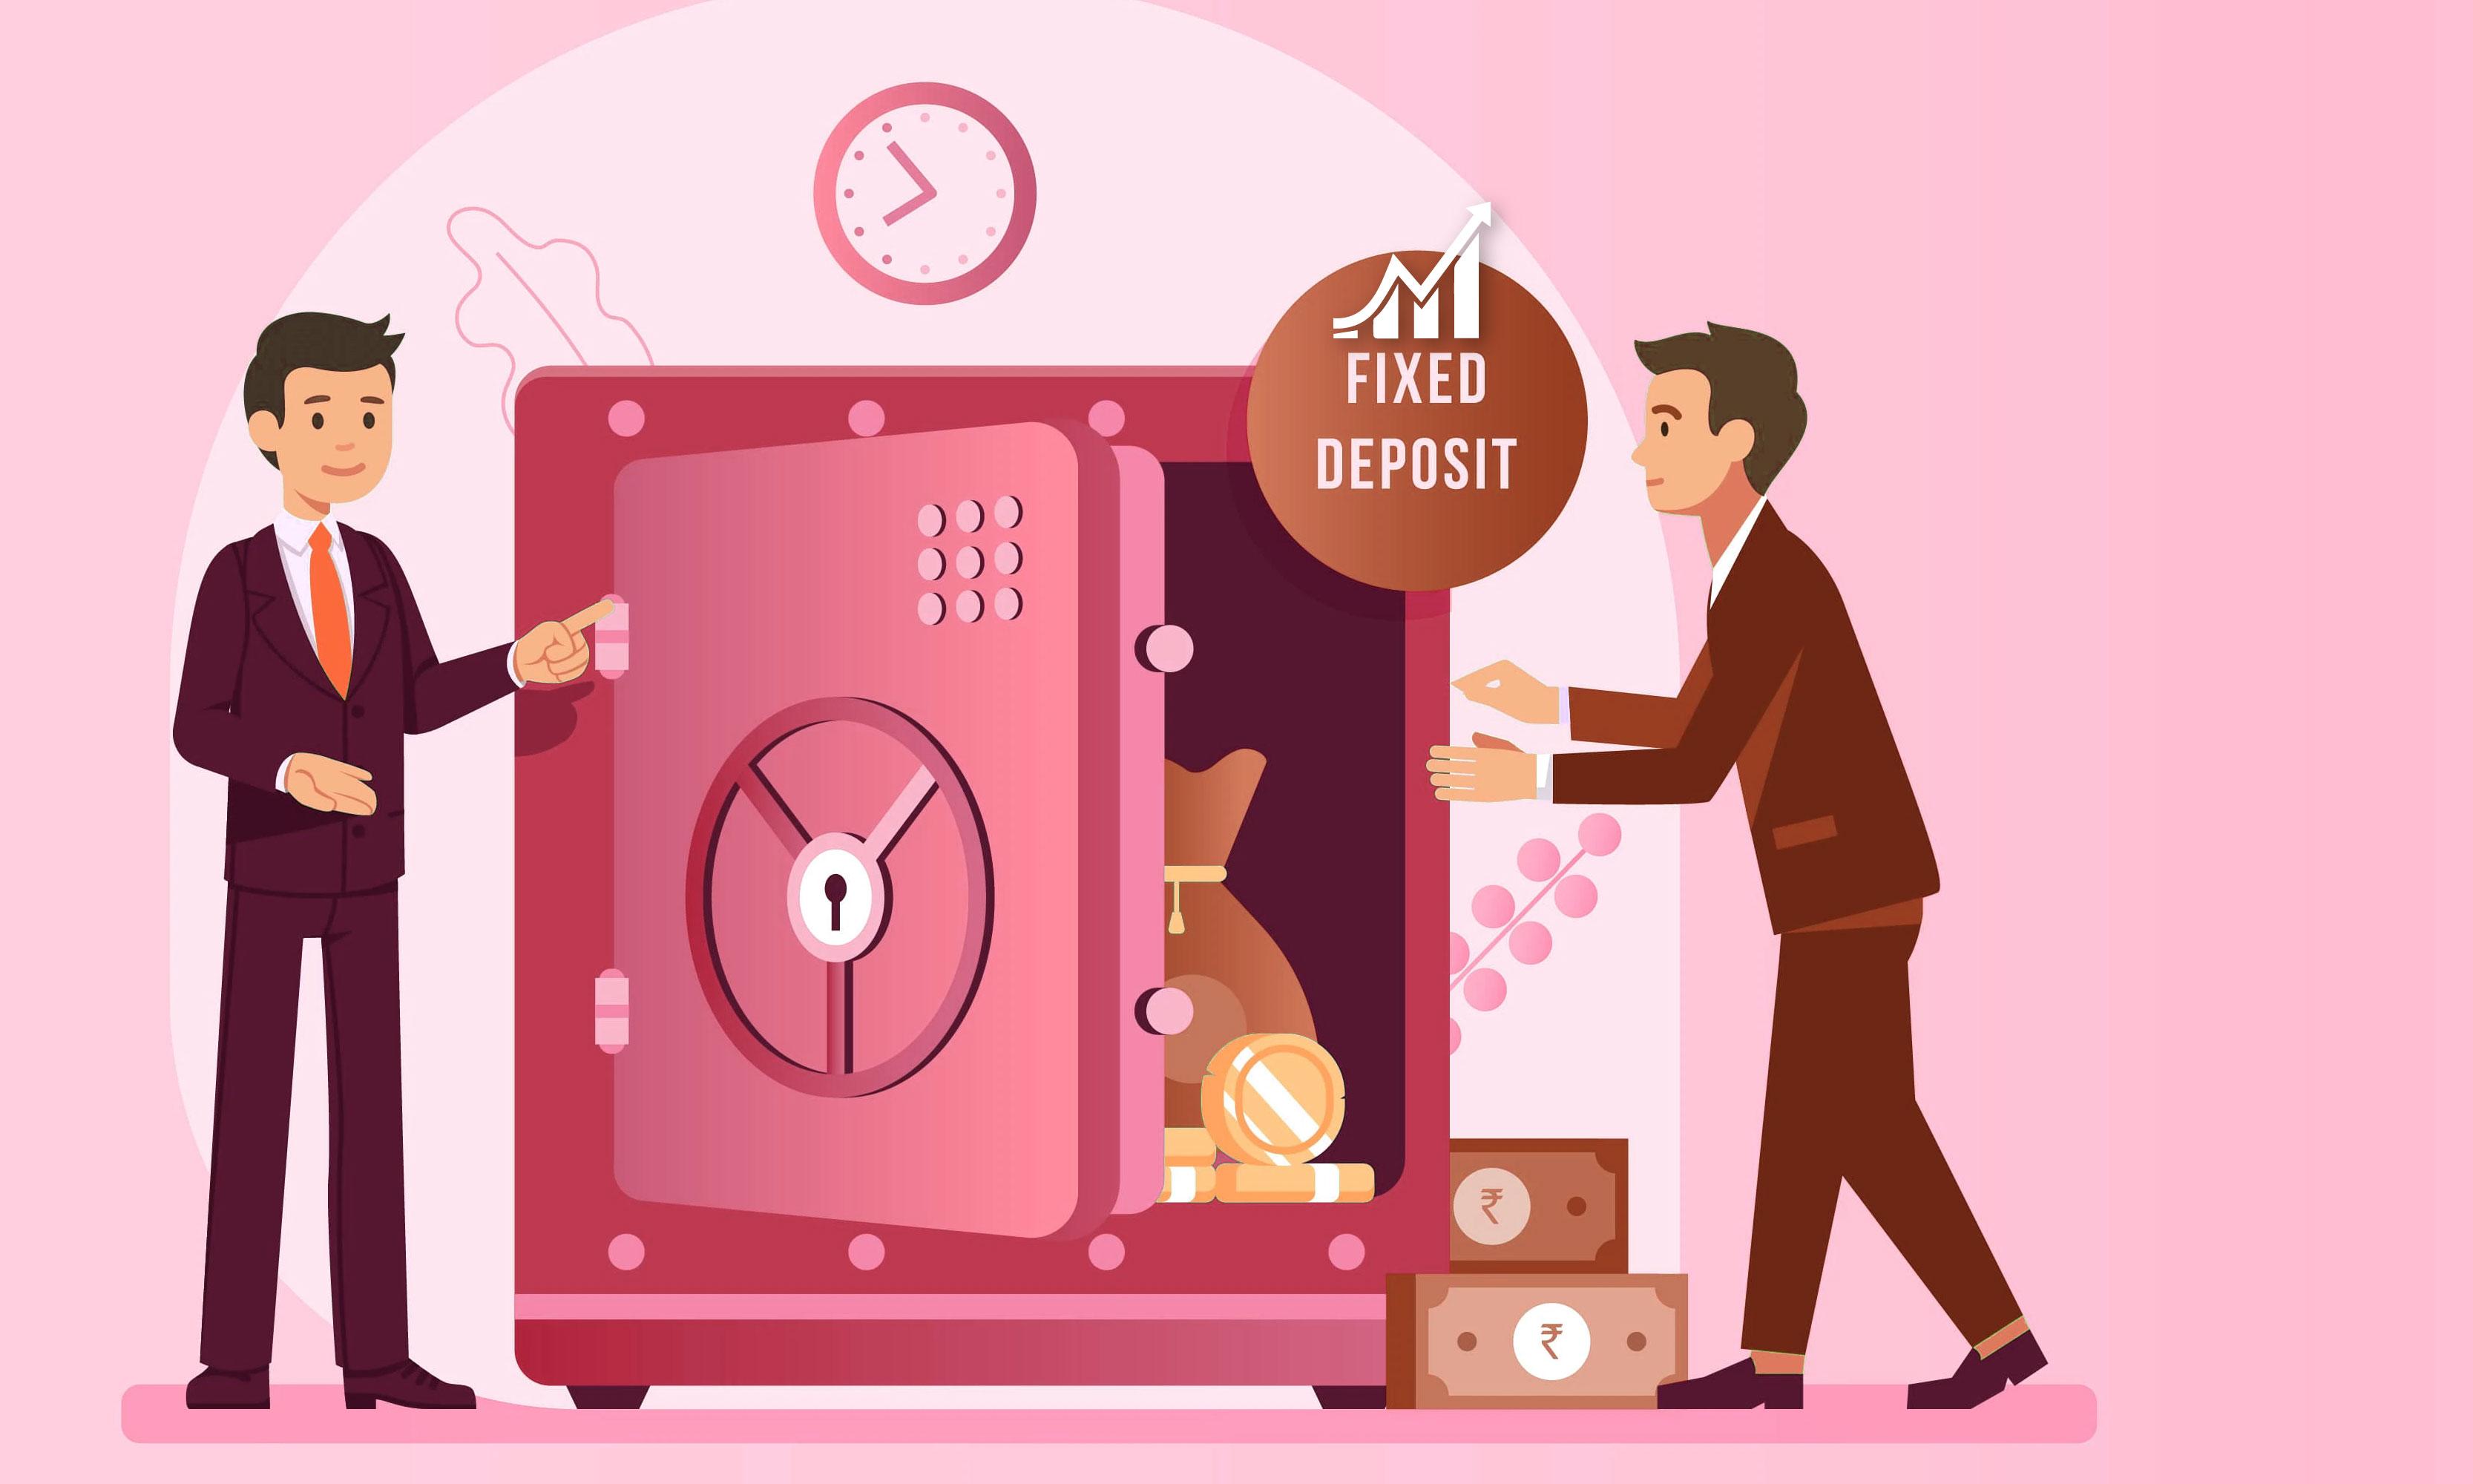 Maximizing HDFC fixed deposit investment returns